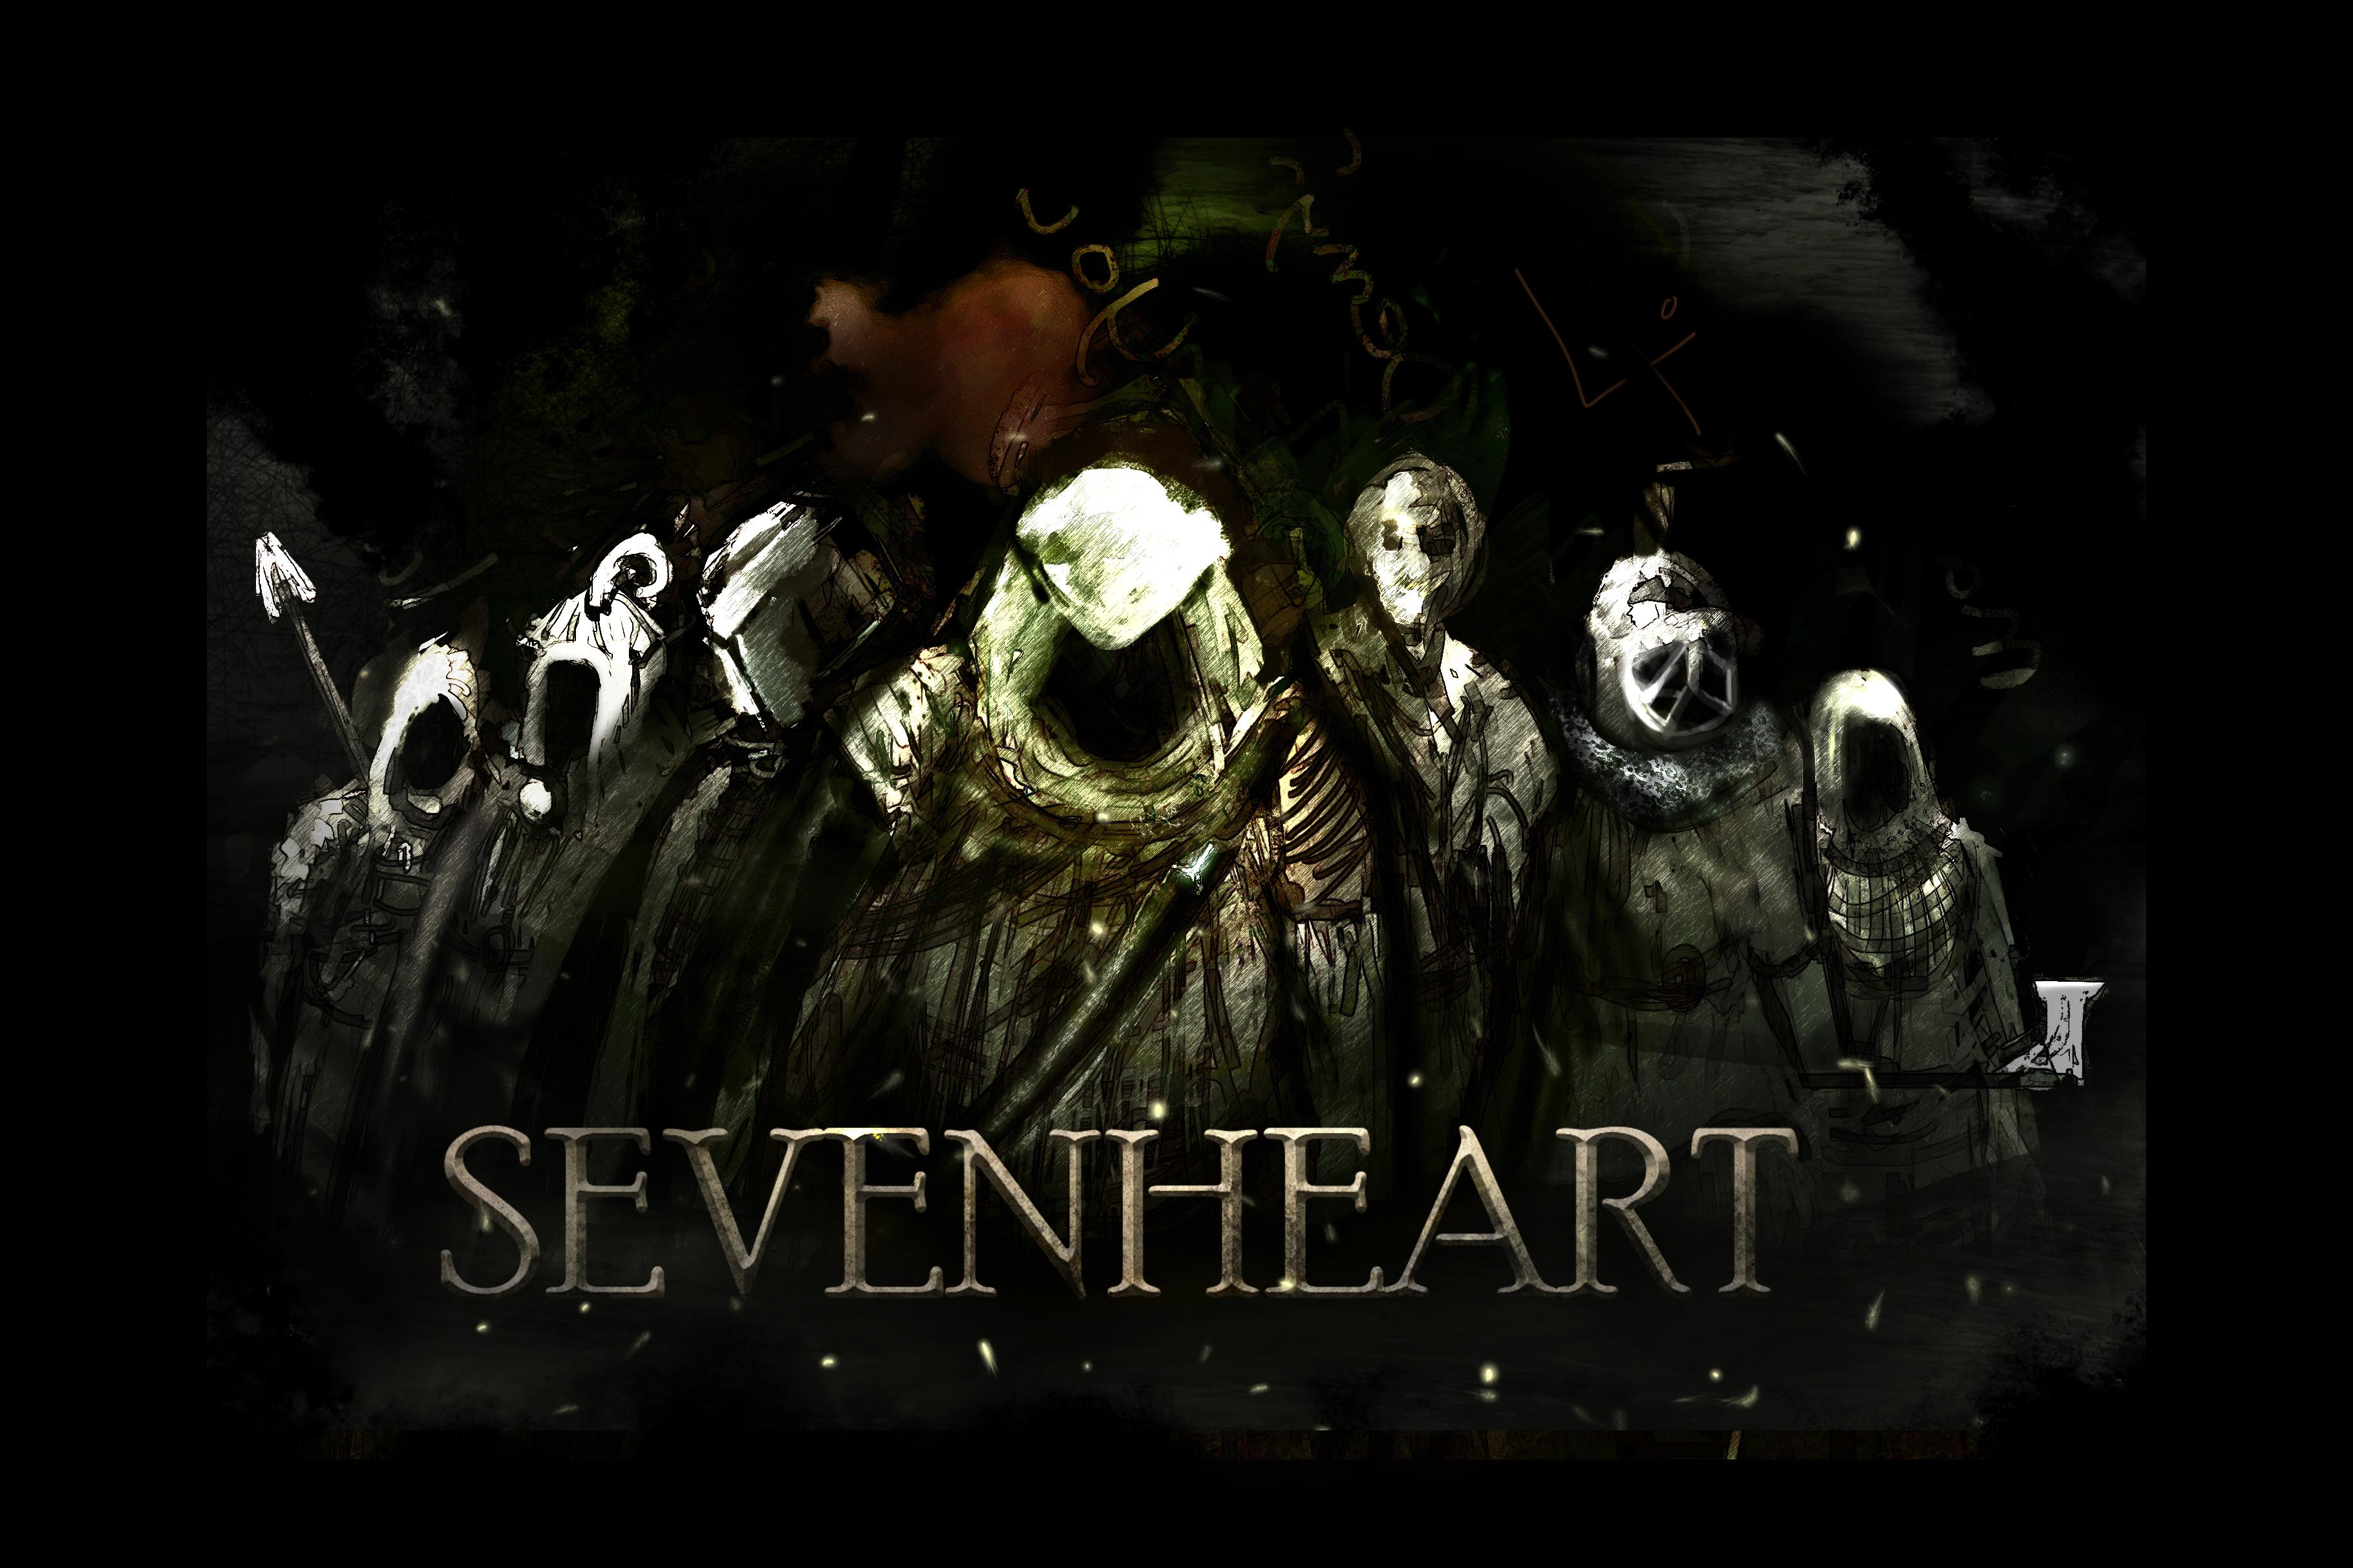 Sevenheart - Order RPG mod for Mount & Blade: Warband